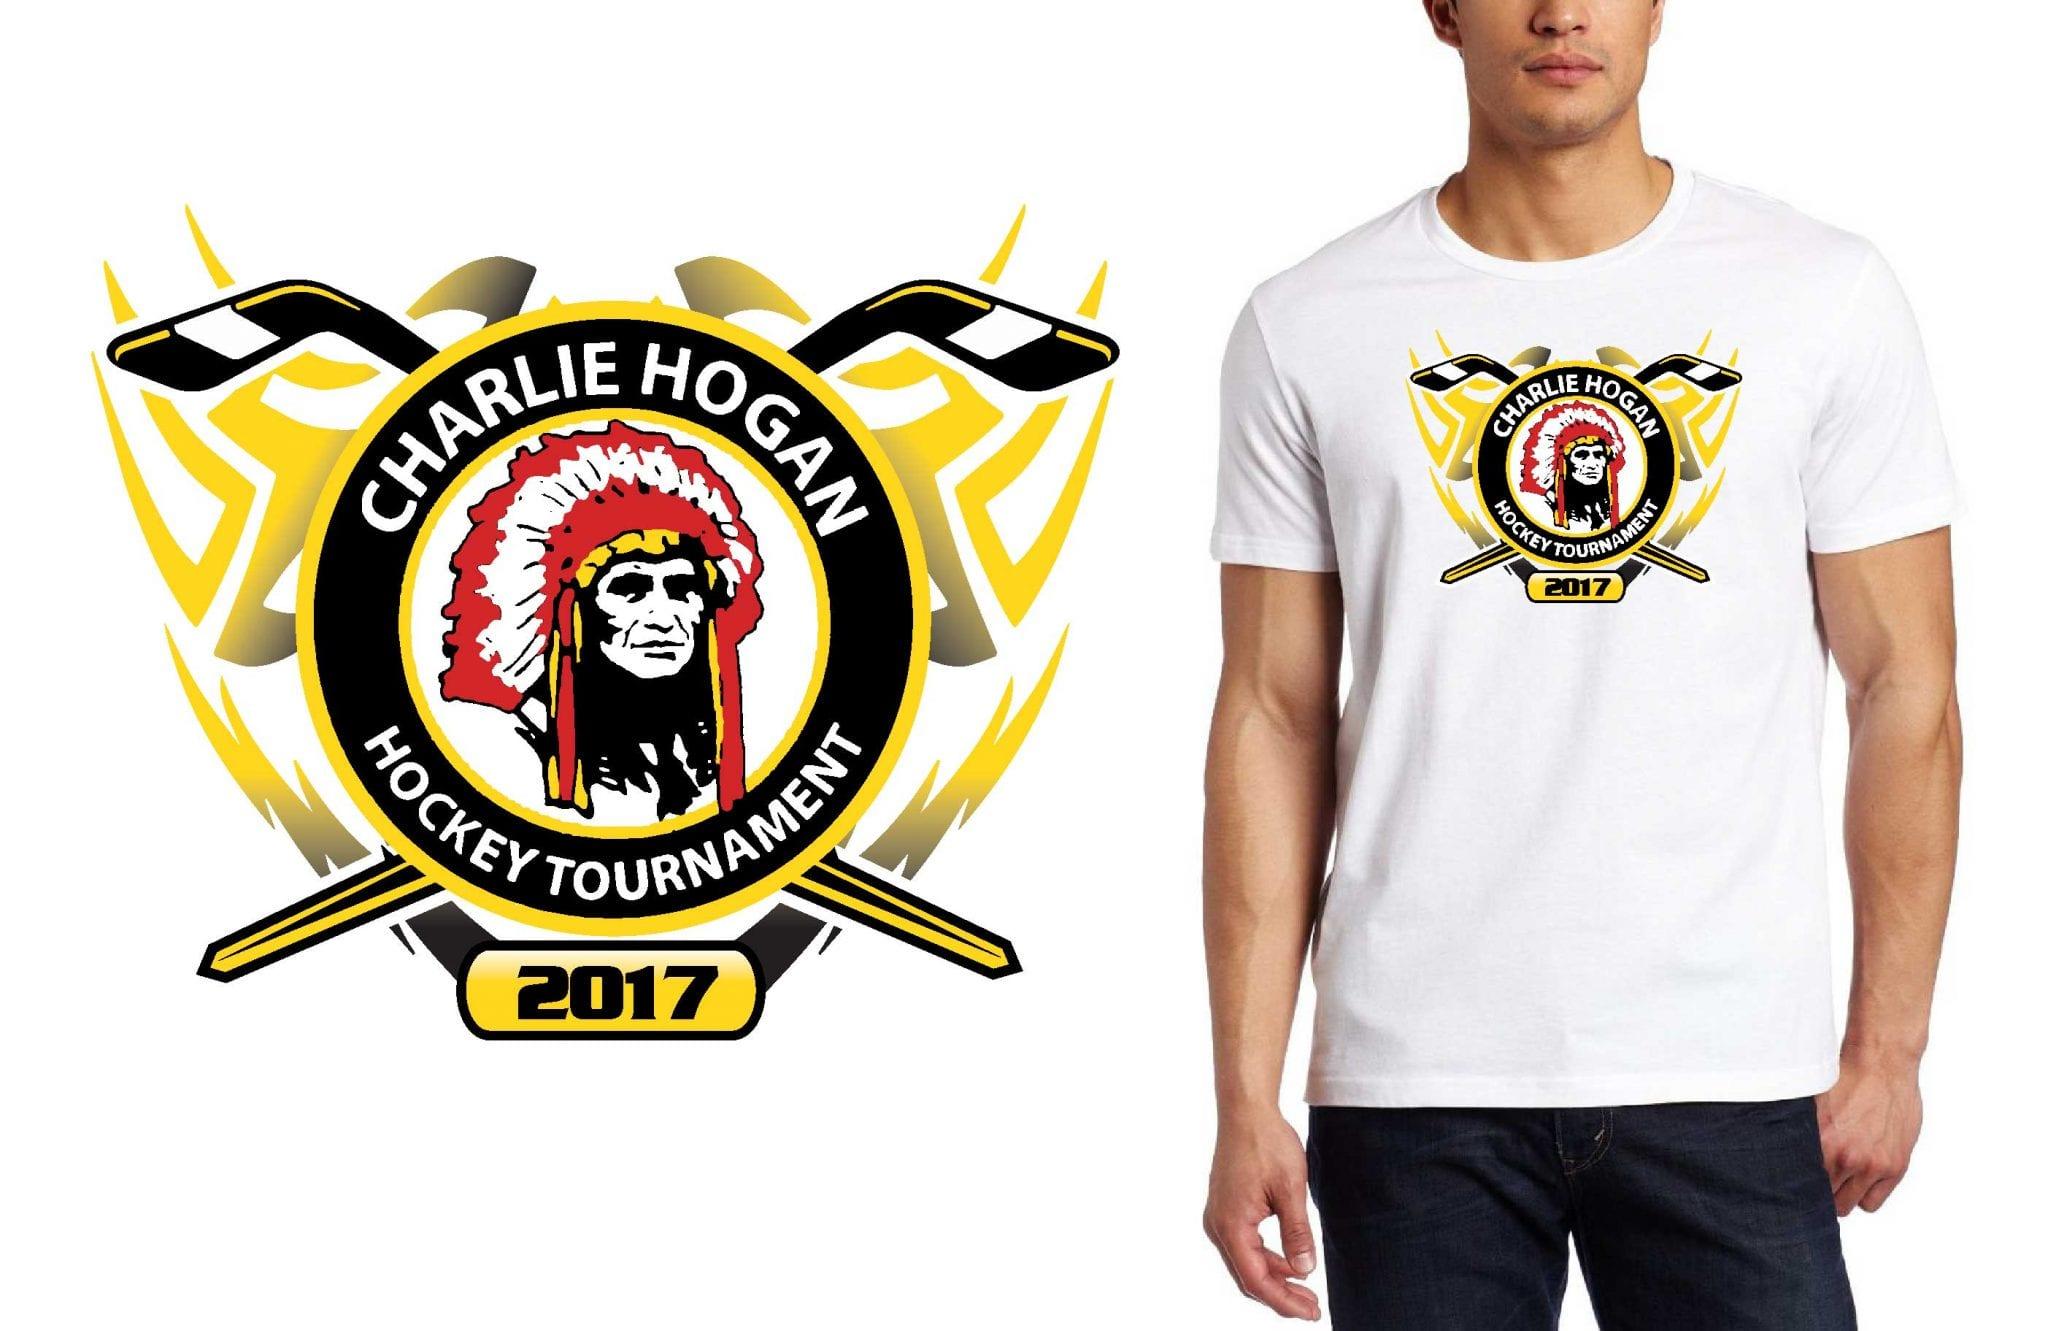 HOCKEY LOGO for Charlie-Hogan-Memorial-Tournament-younger-players T-SHIRT UrArtStudio